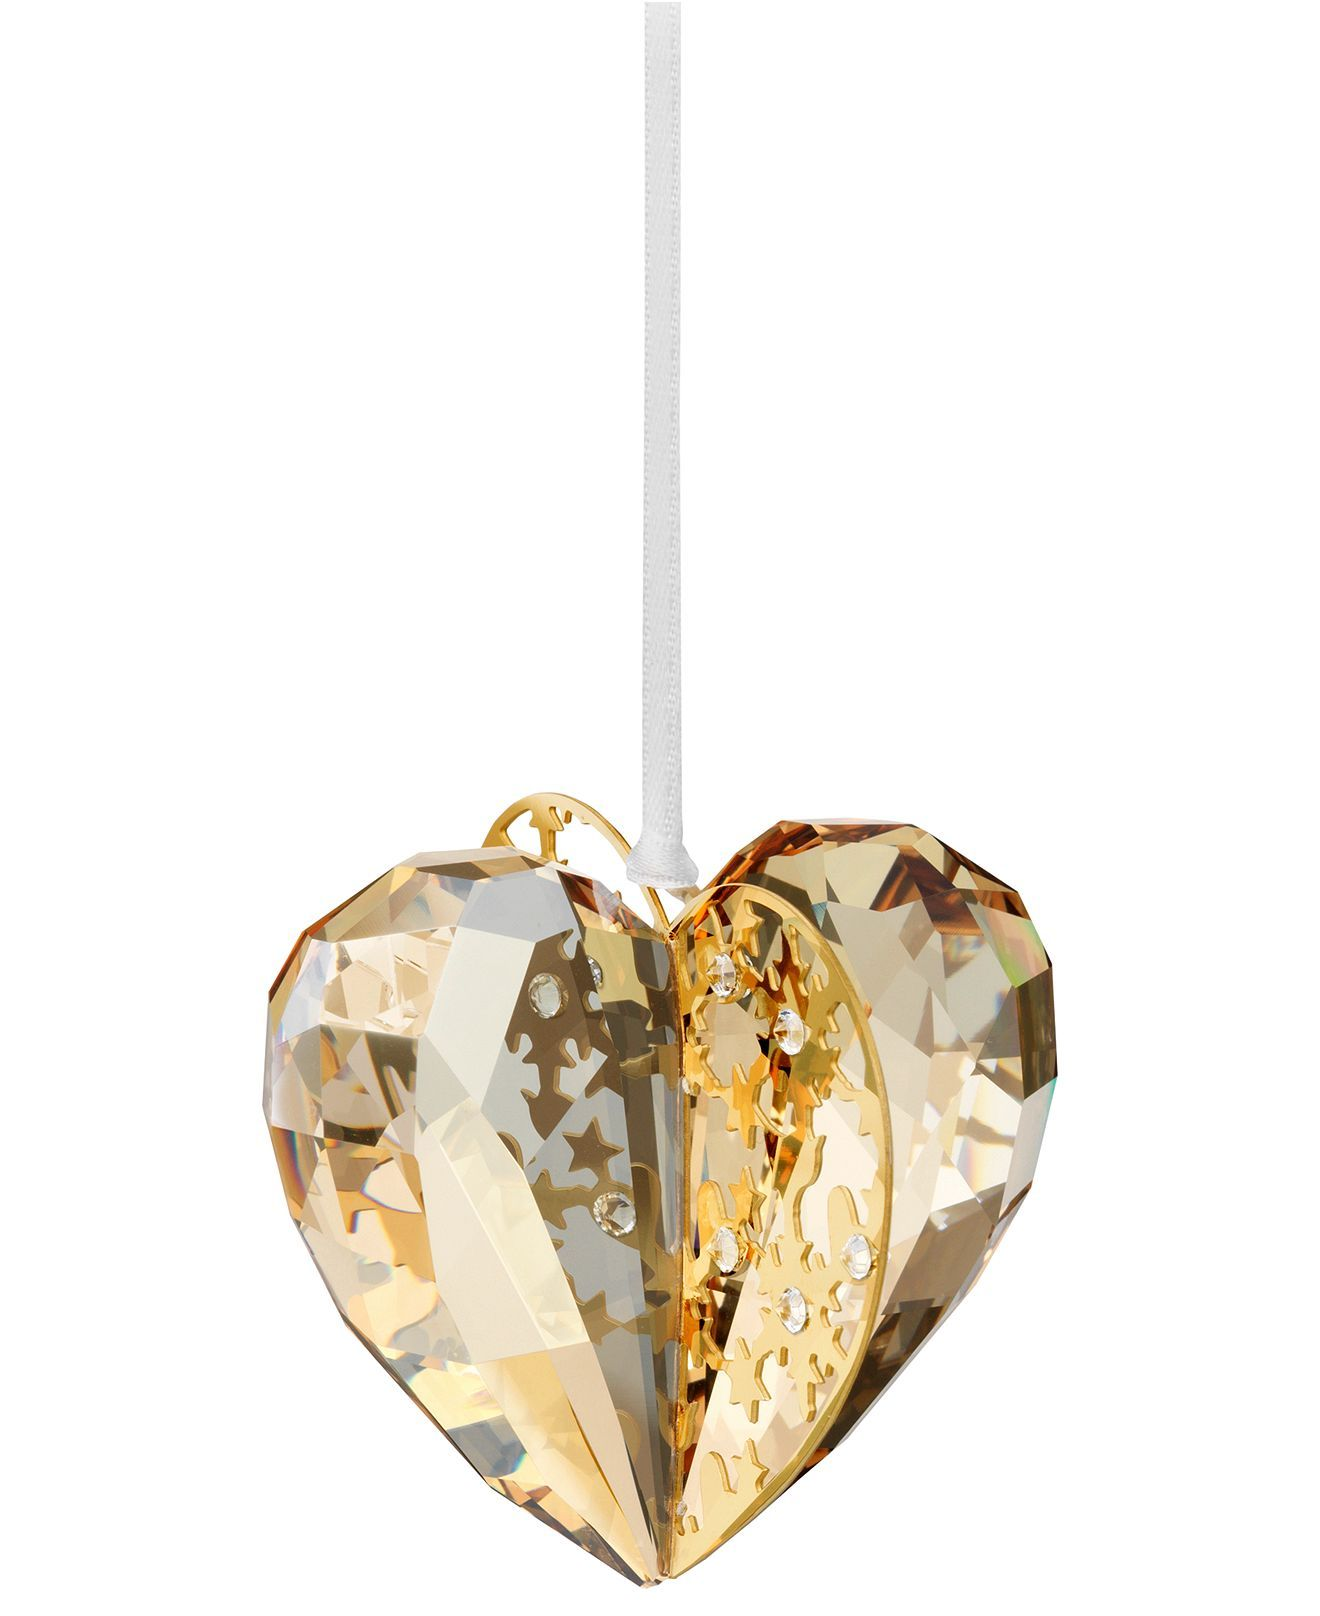 Swarovski Christmas Ornament, Golden Shadow Heart